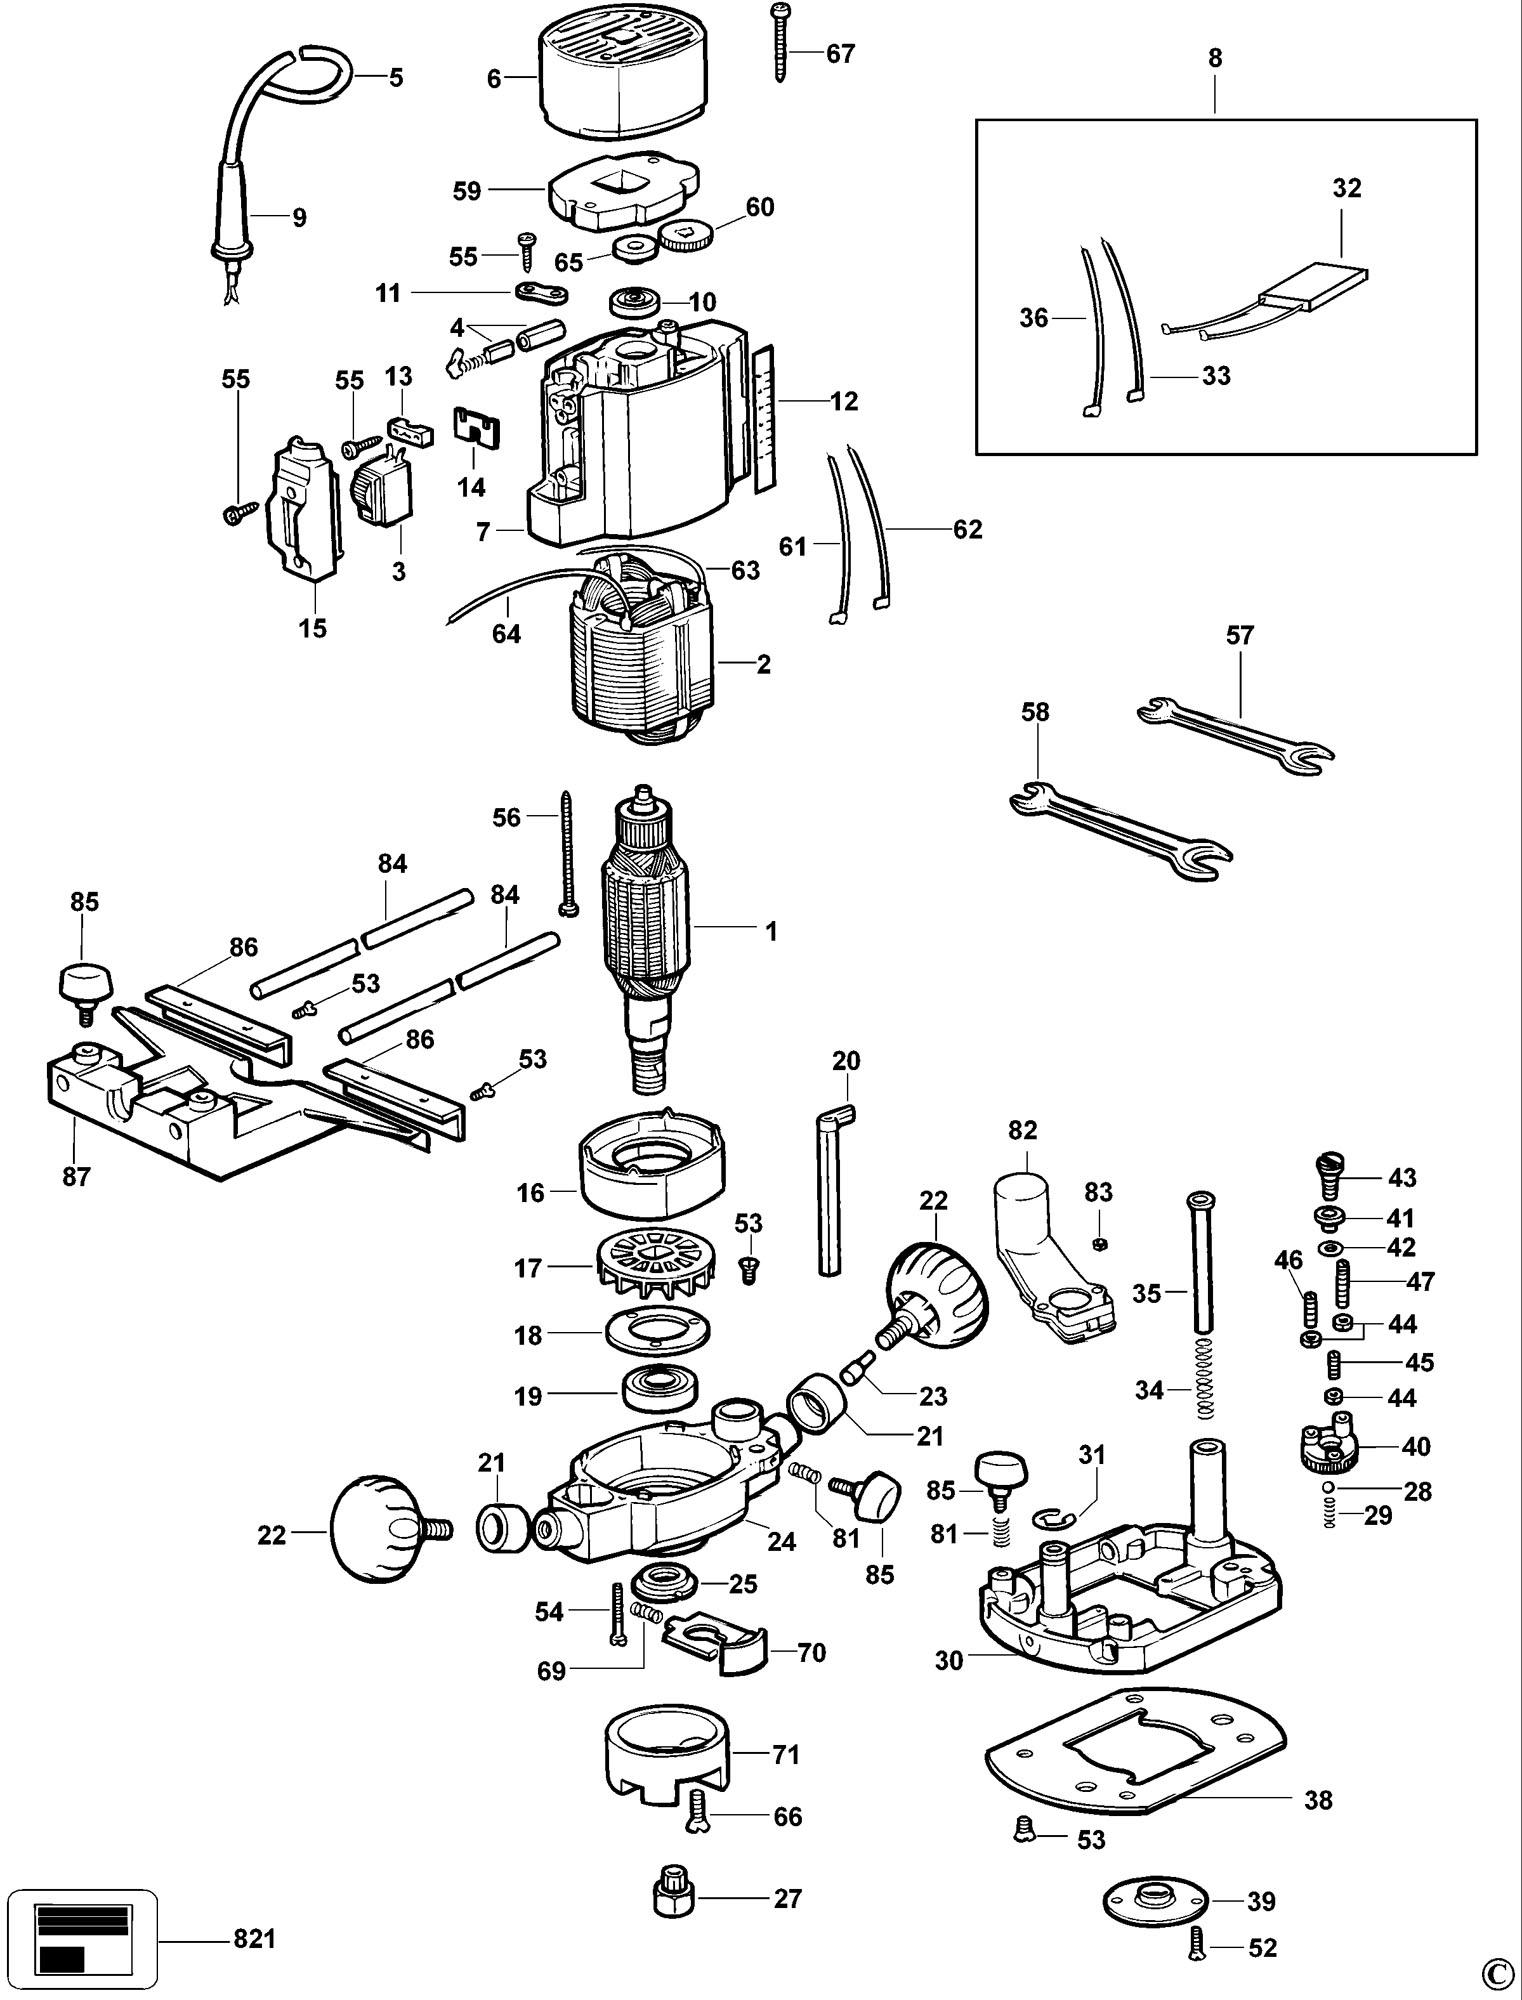 Spares For Dewalt Dw615 Router Type 4 Spare Dw615 Type 4